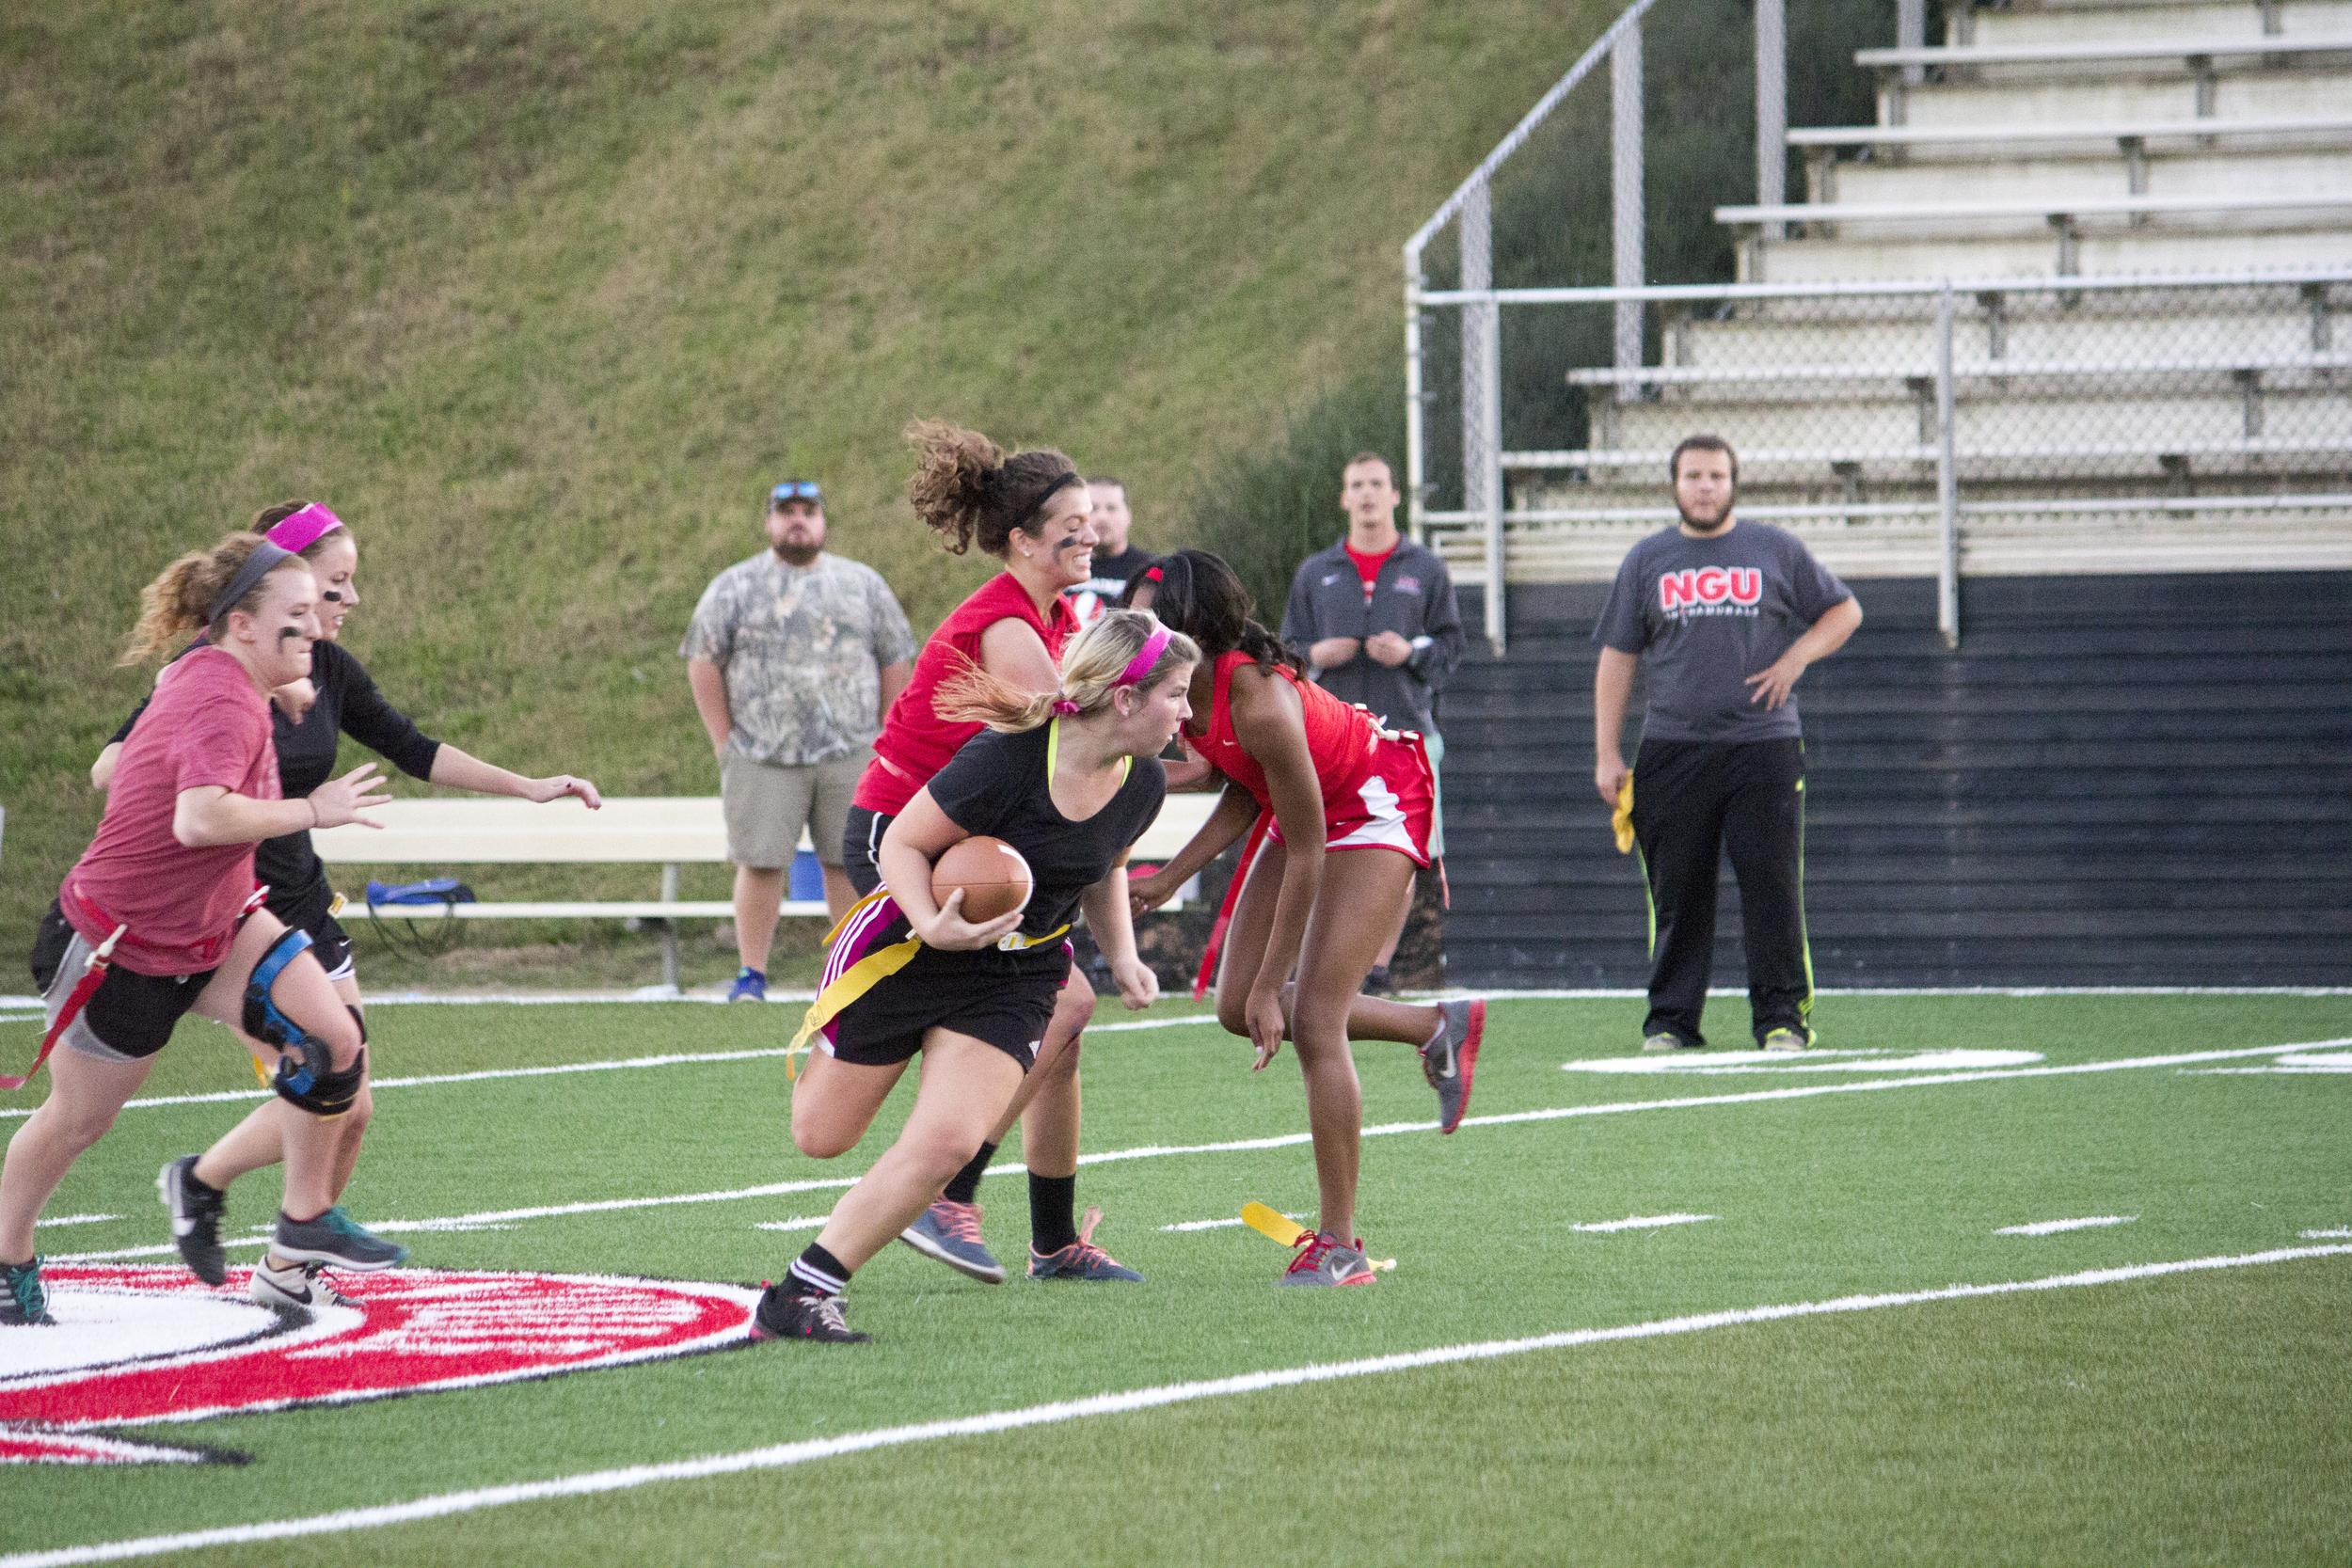 Junior Alexandria Cloer tries to sneak past her rival senior players.